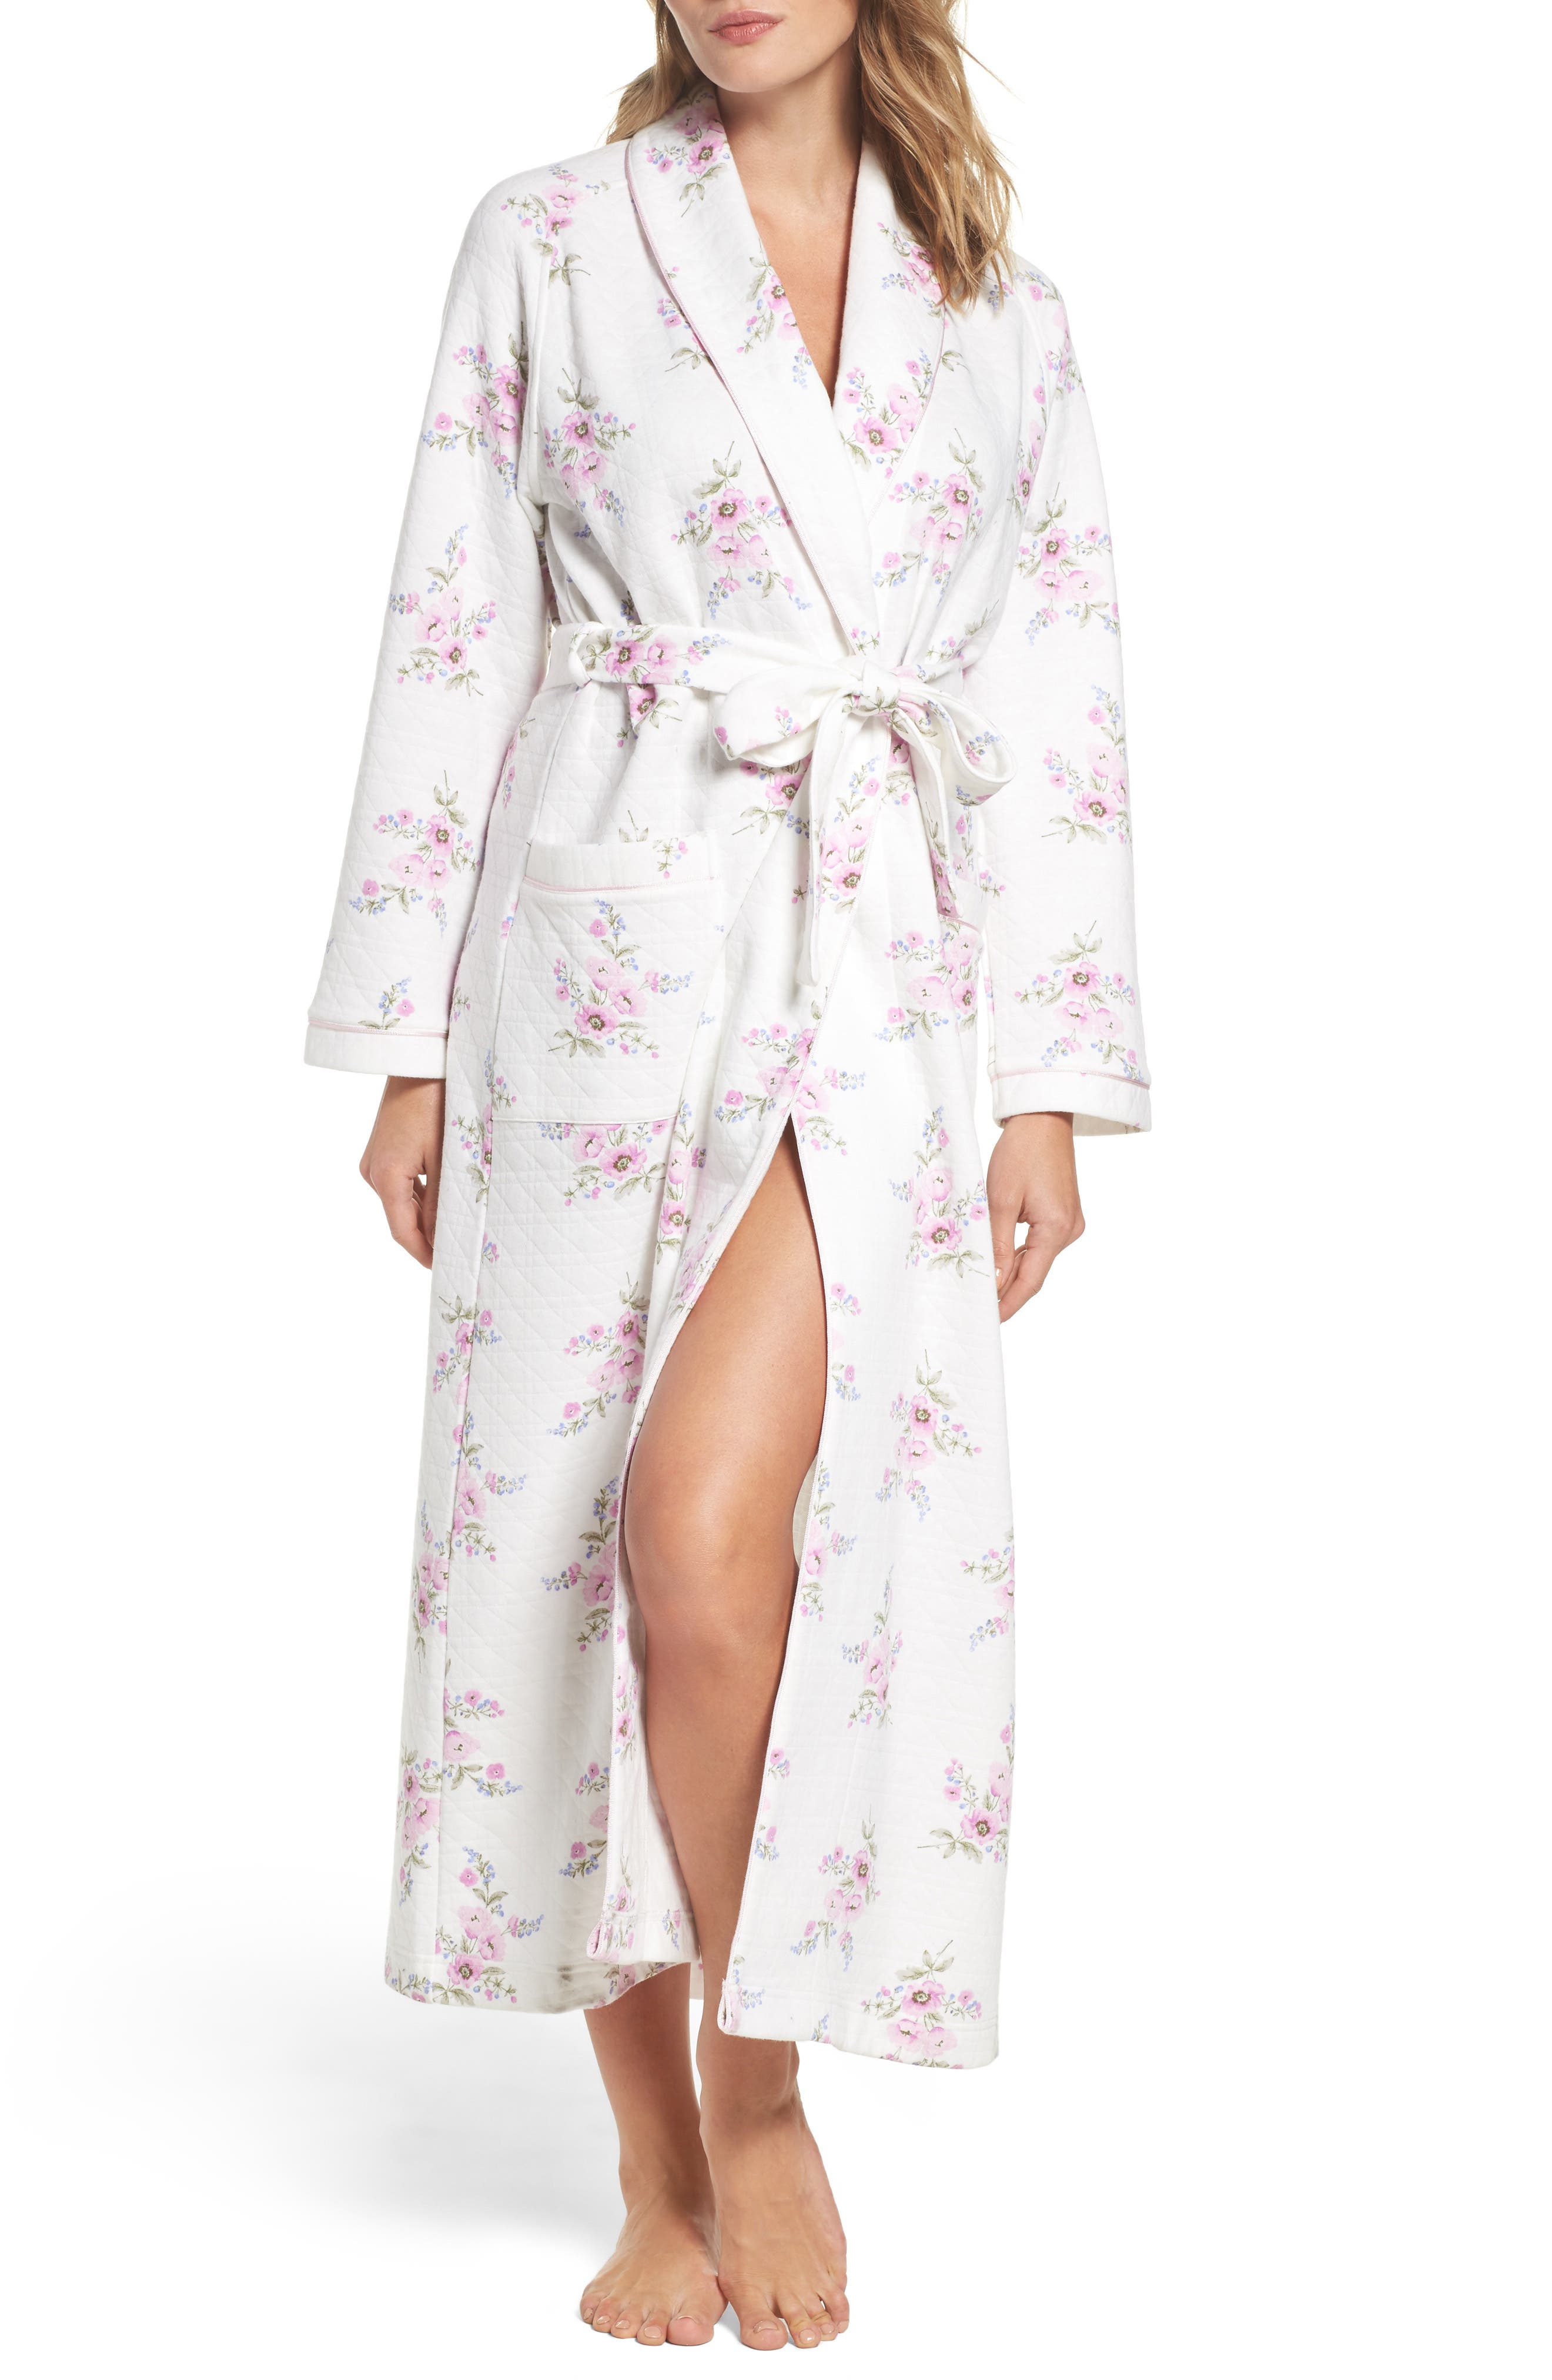 Carole Hochman Floral Print Robe